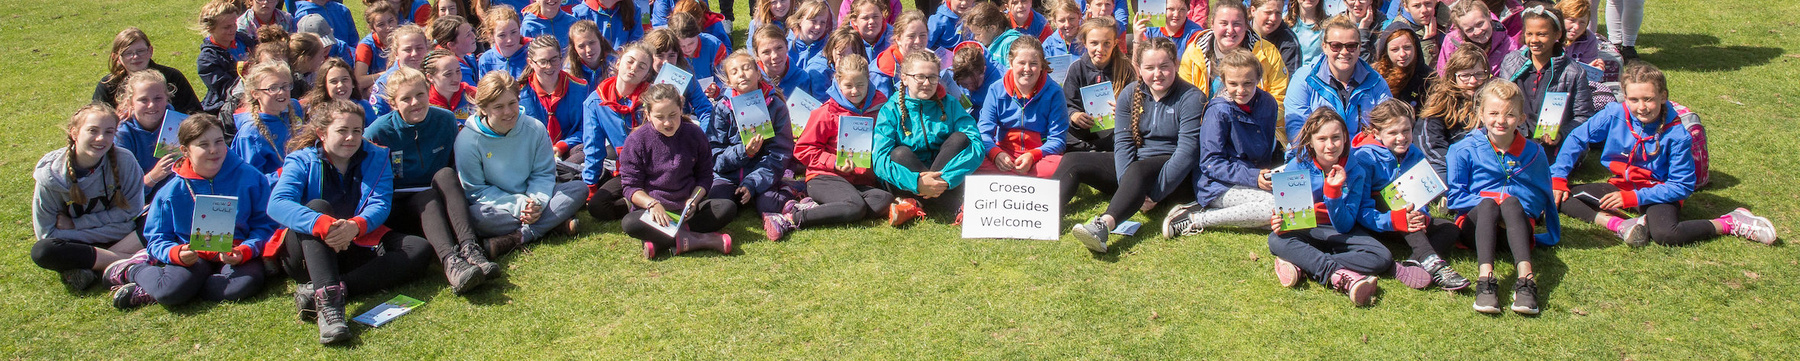 Girl Guides Event Nefyn Golf August 2017-61